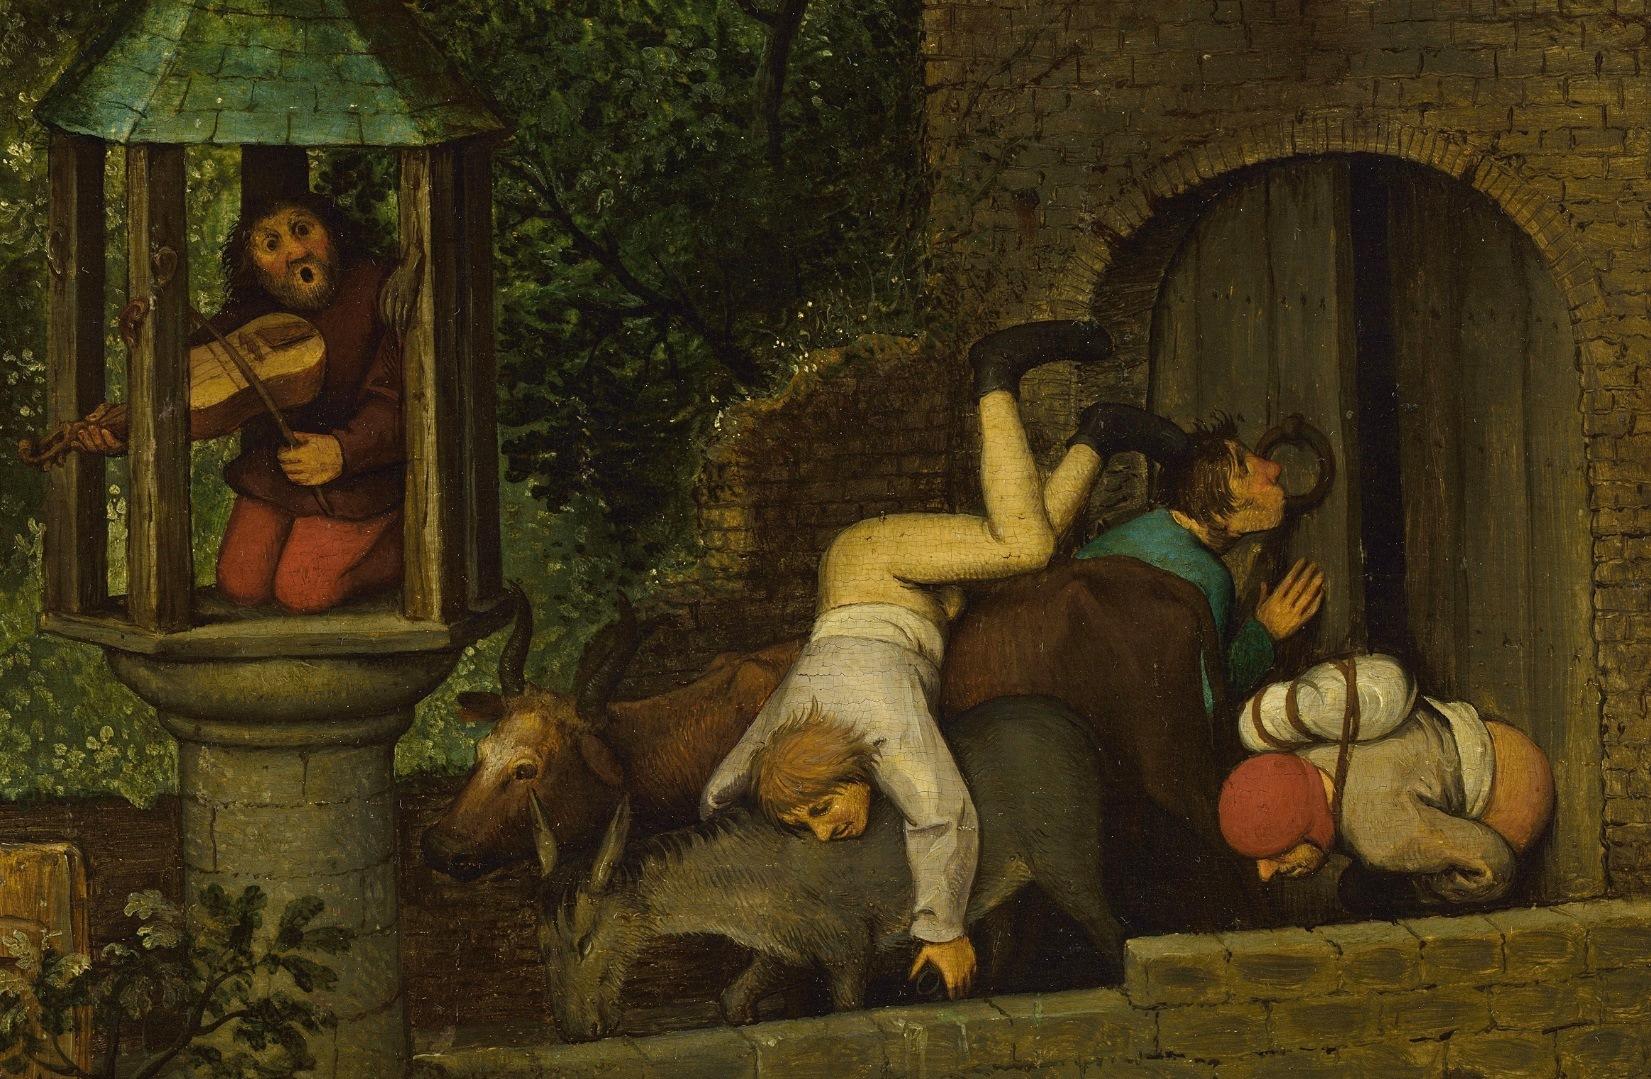 brueghel-proverbs-019.jpg